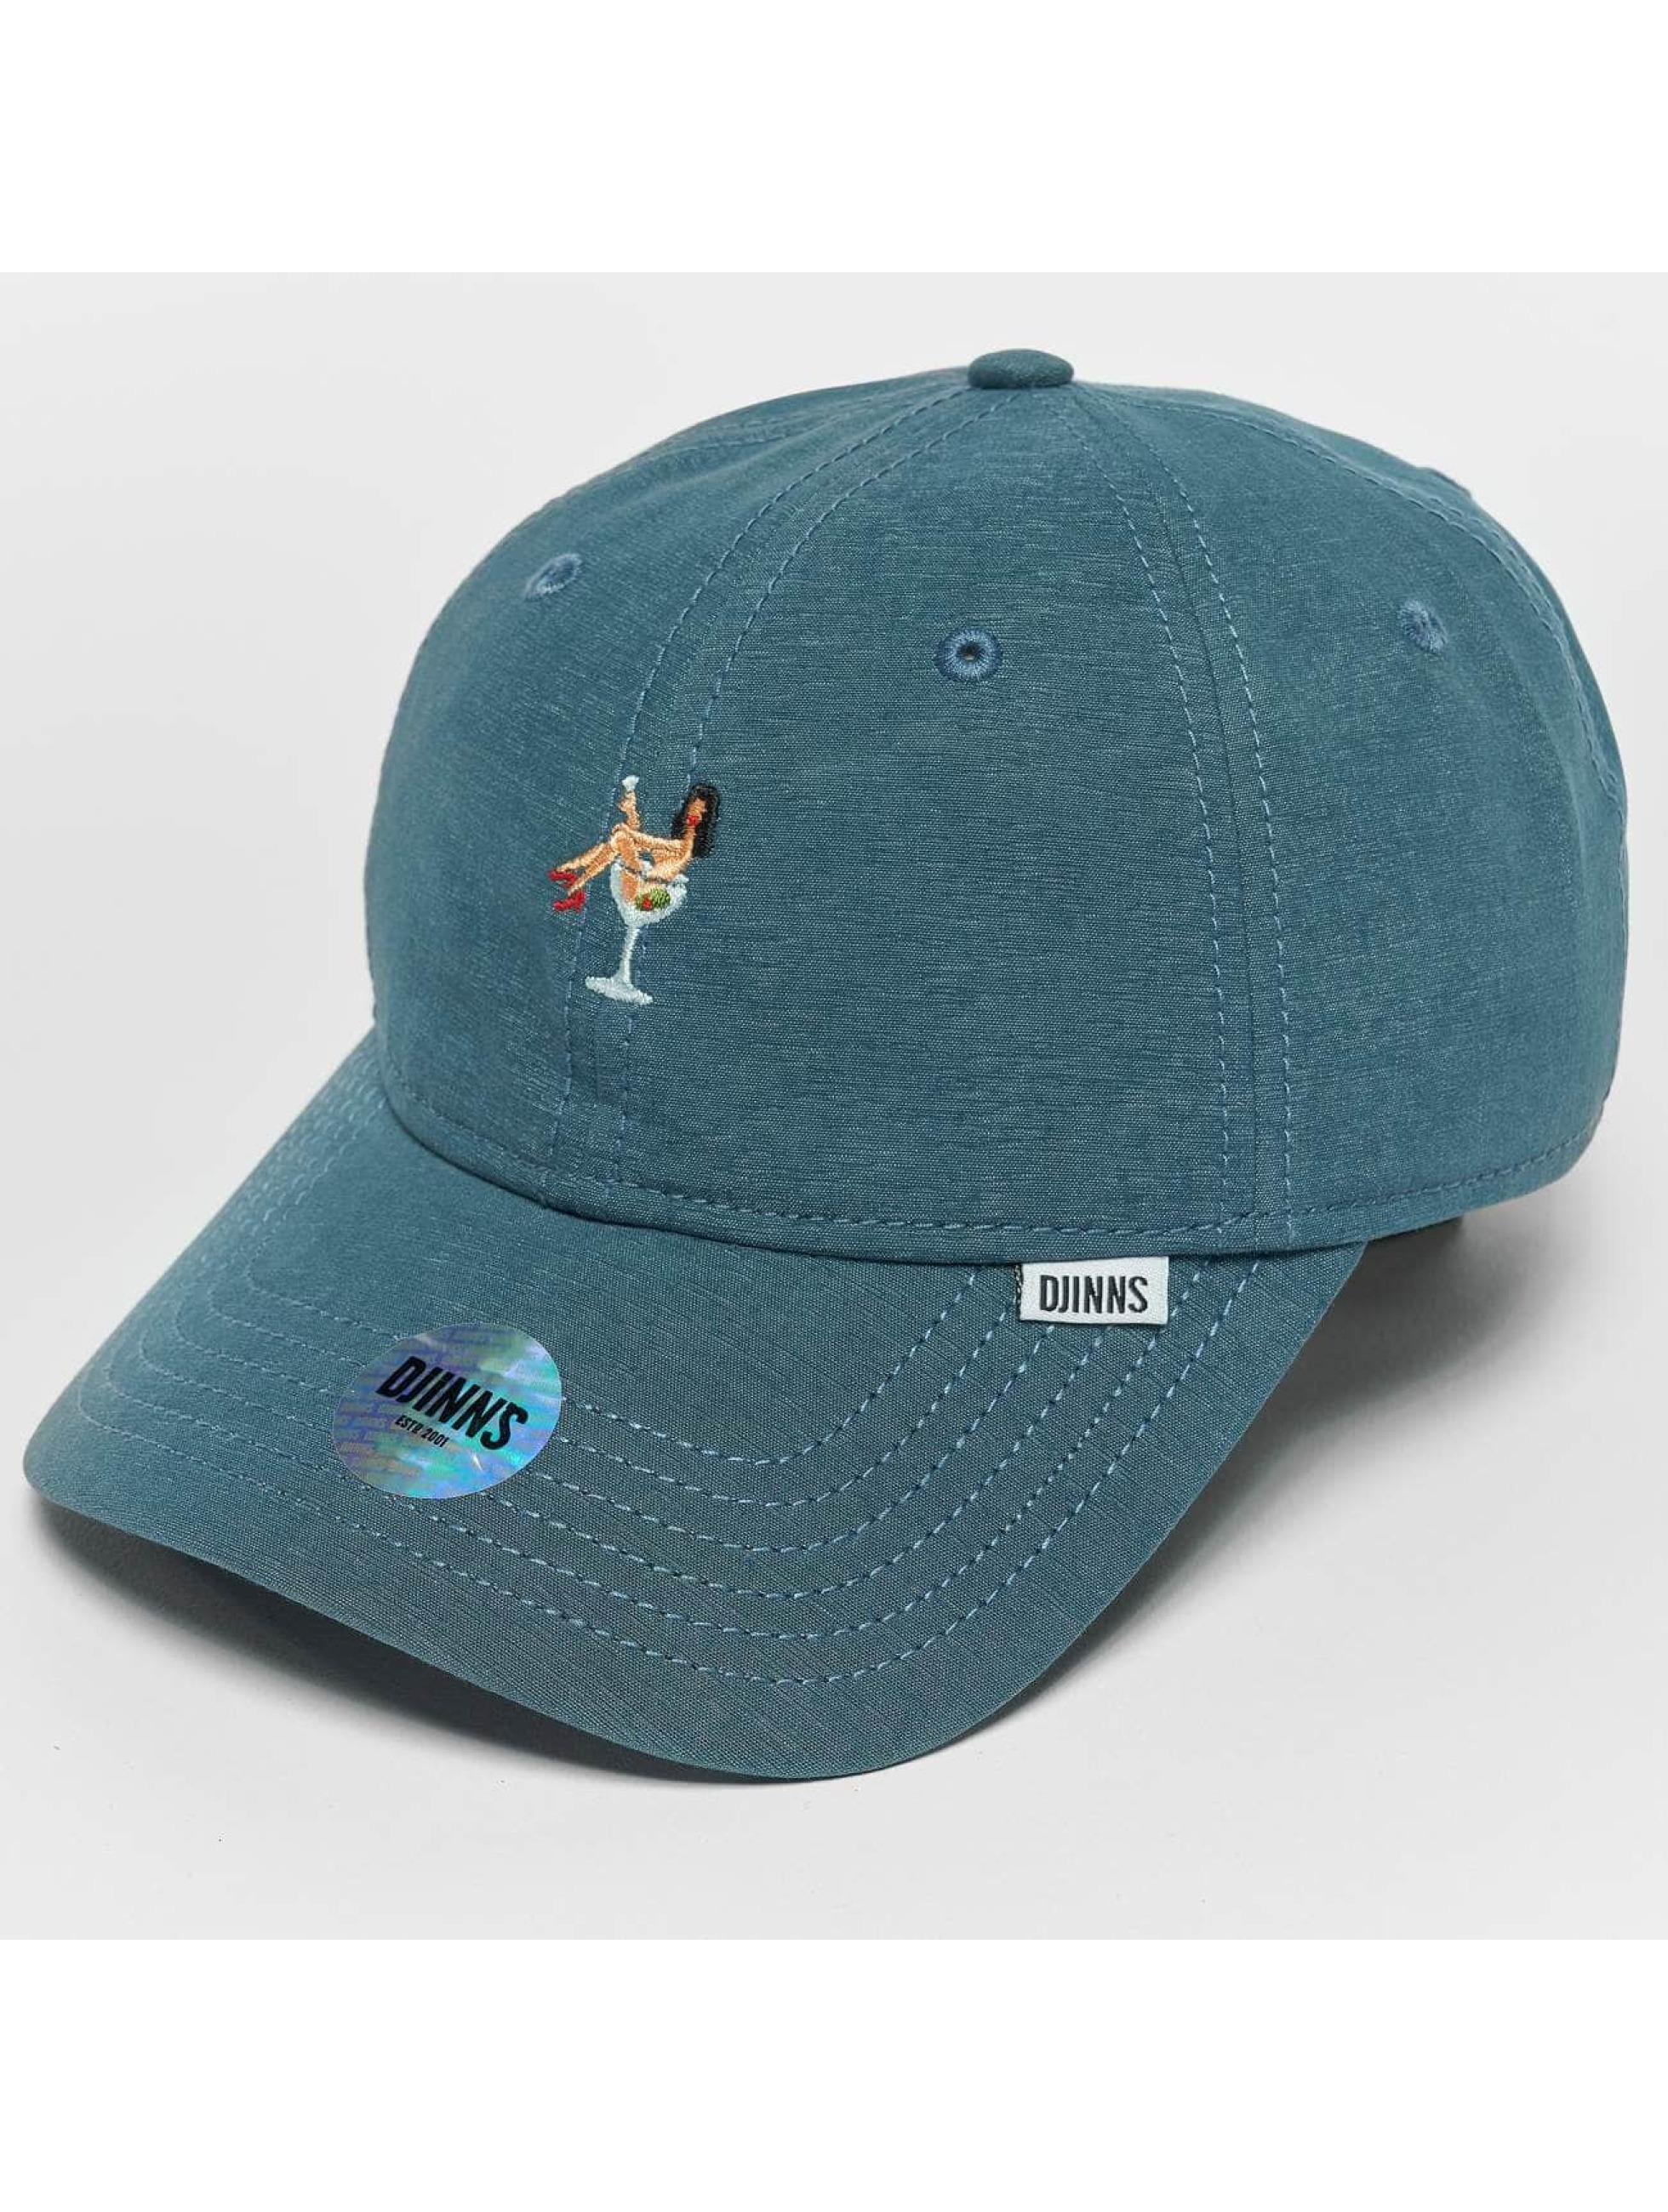 Djinns Snapback Caps Jersey Girl Dad modrý